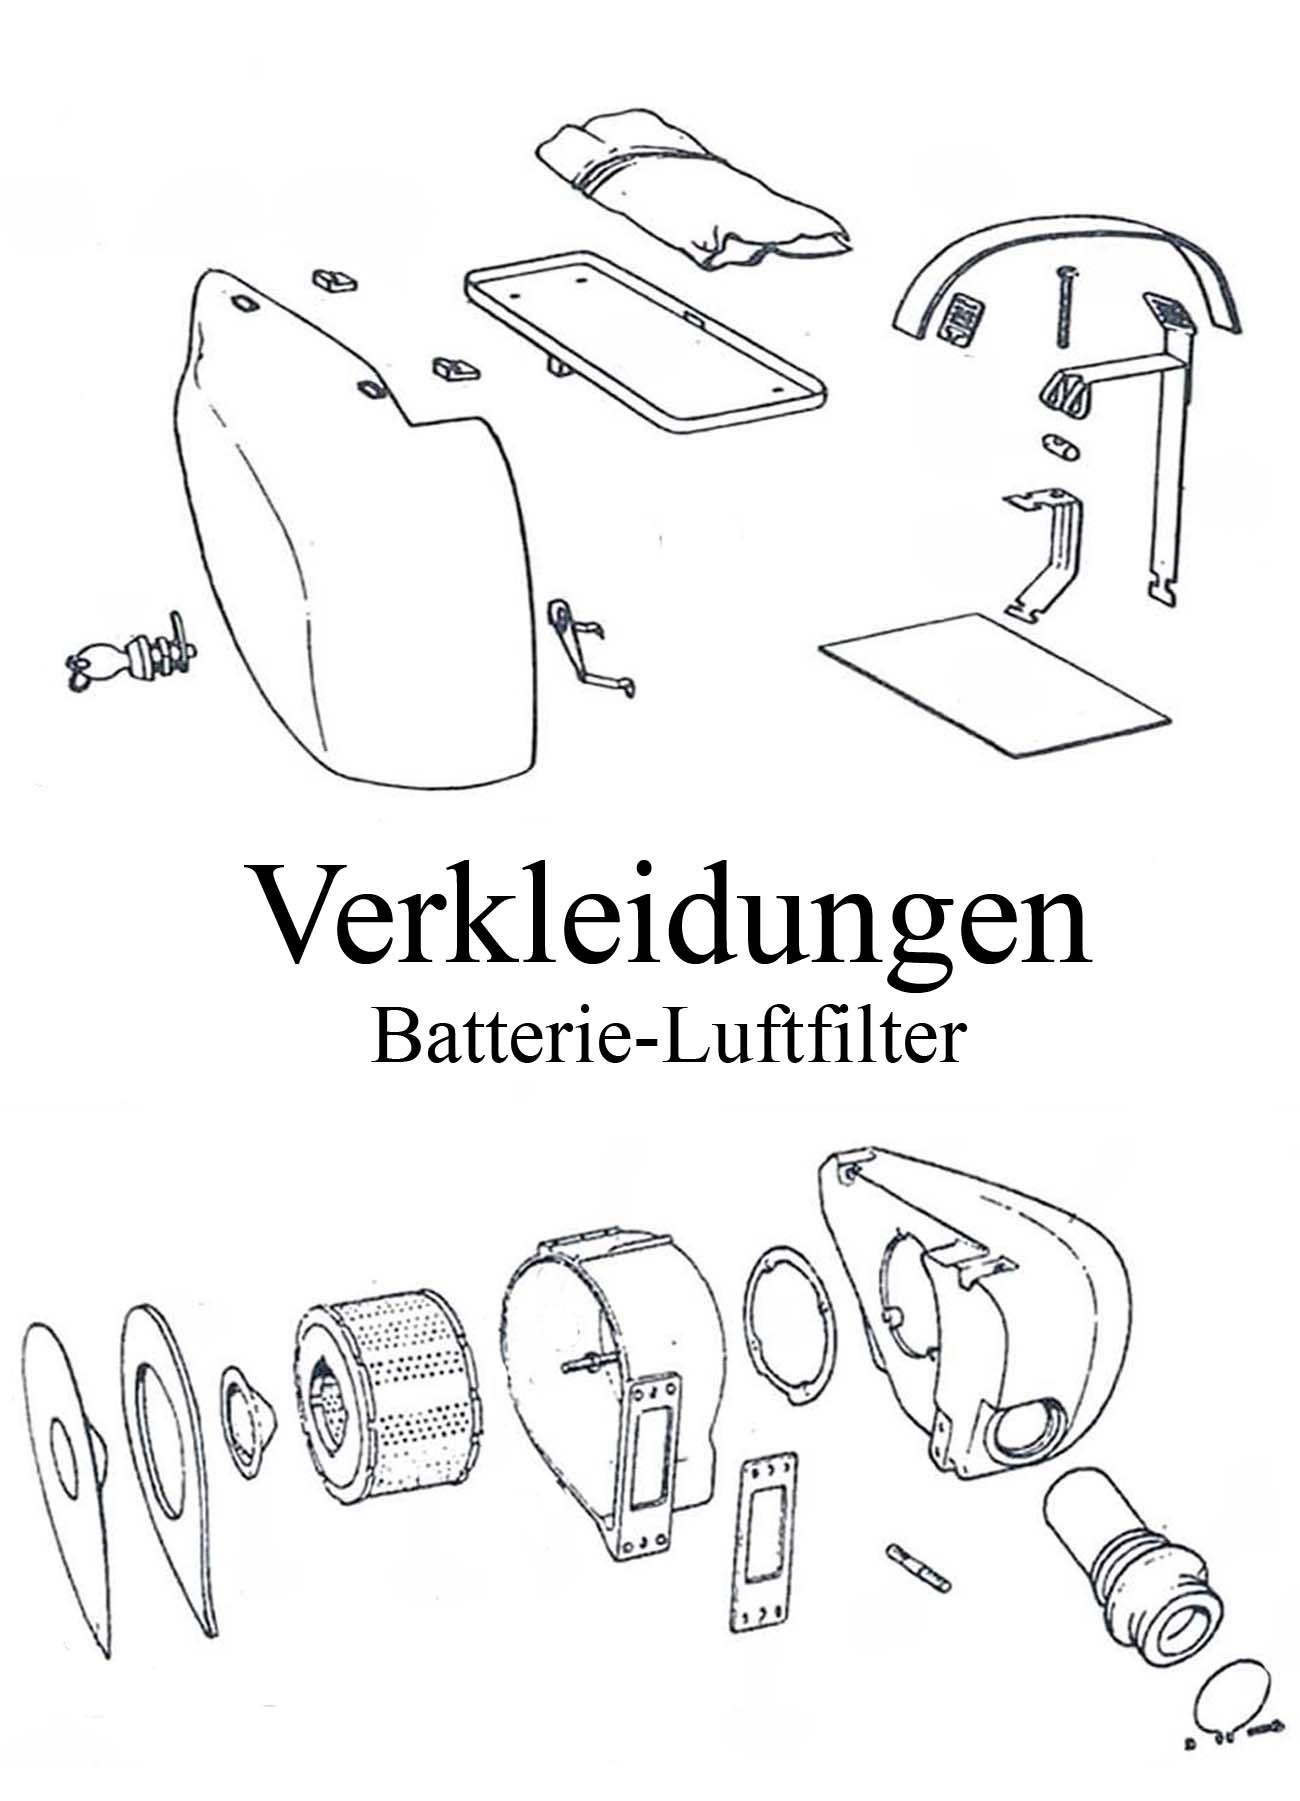 MZ ETZ 251 Ersatzteileliste Verkleidungen Seitendeckel Aufkleber Schloss Batteriespannband Werkzeugfach Luftfilter Dichtung Ansauggummi